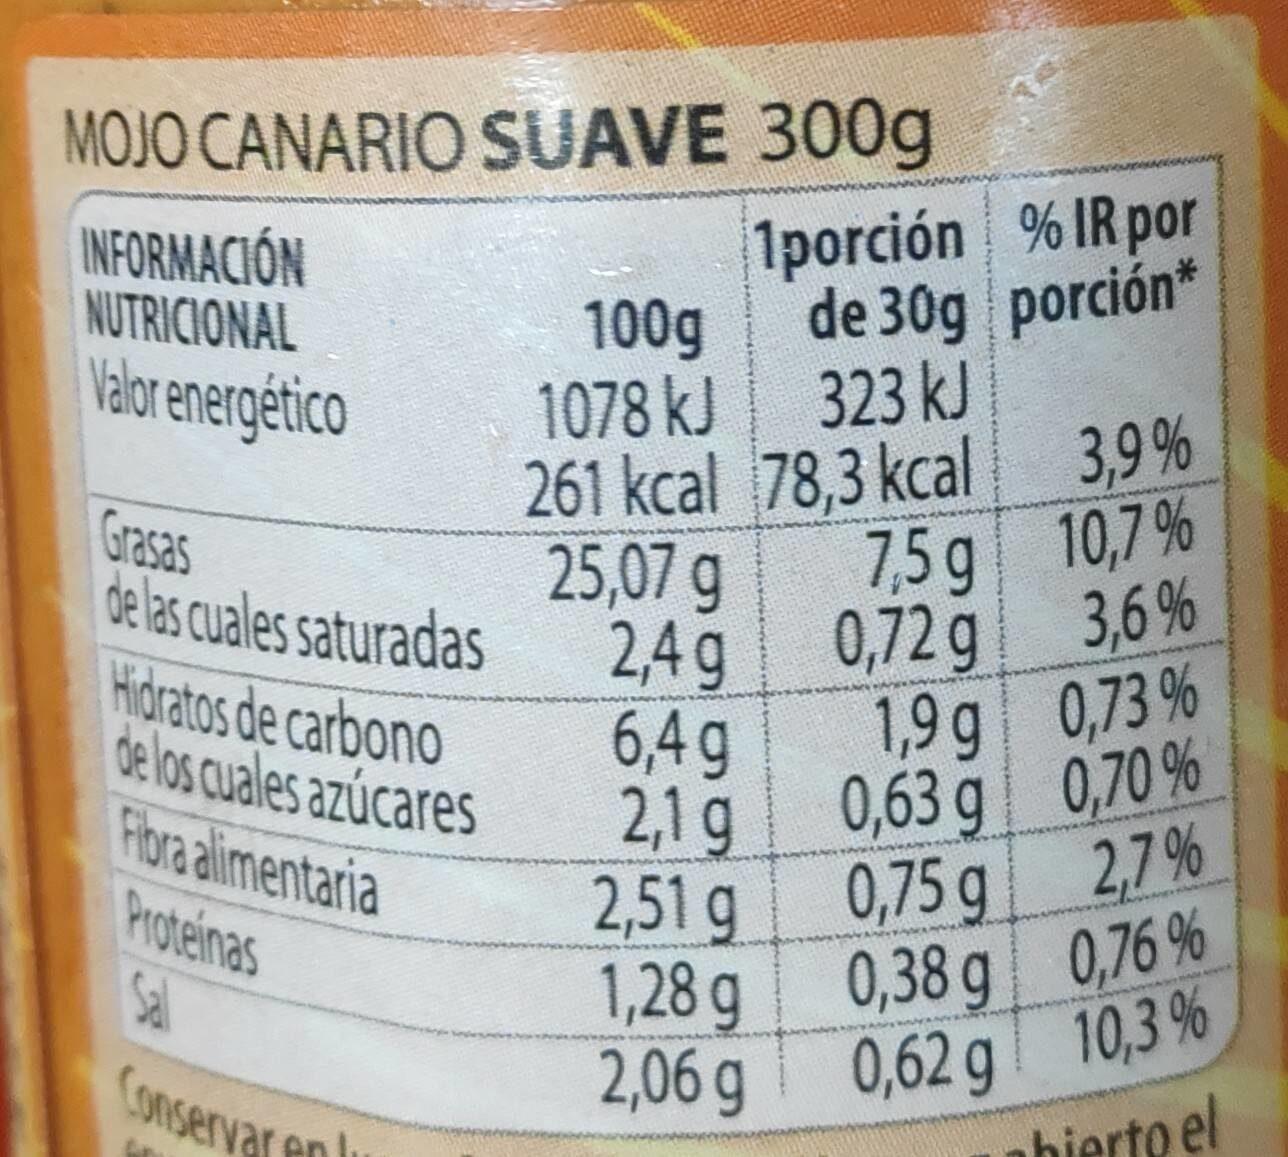 Mojo canario suave - Nutrition facts